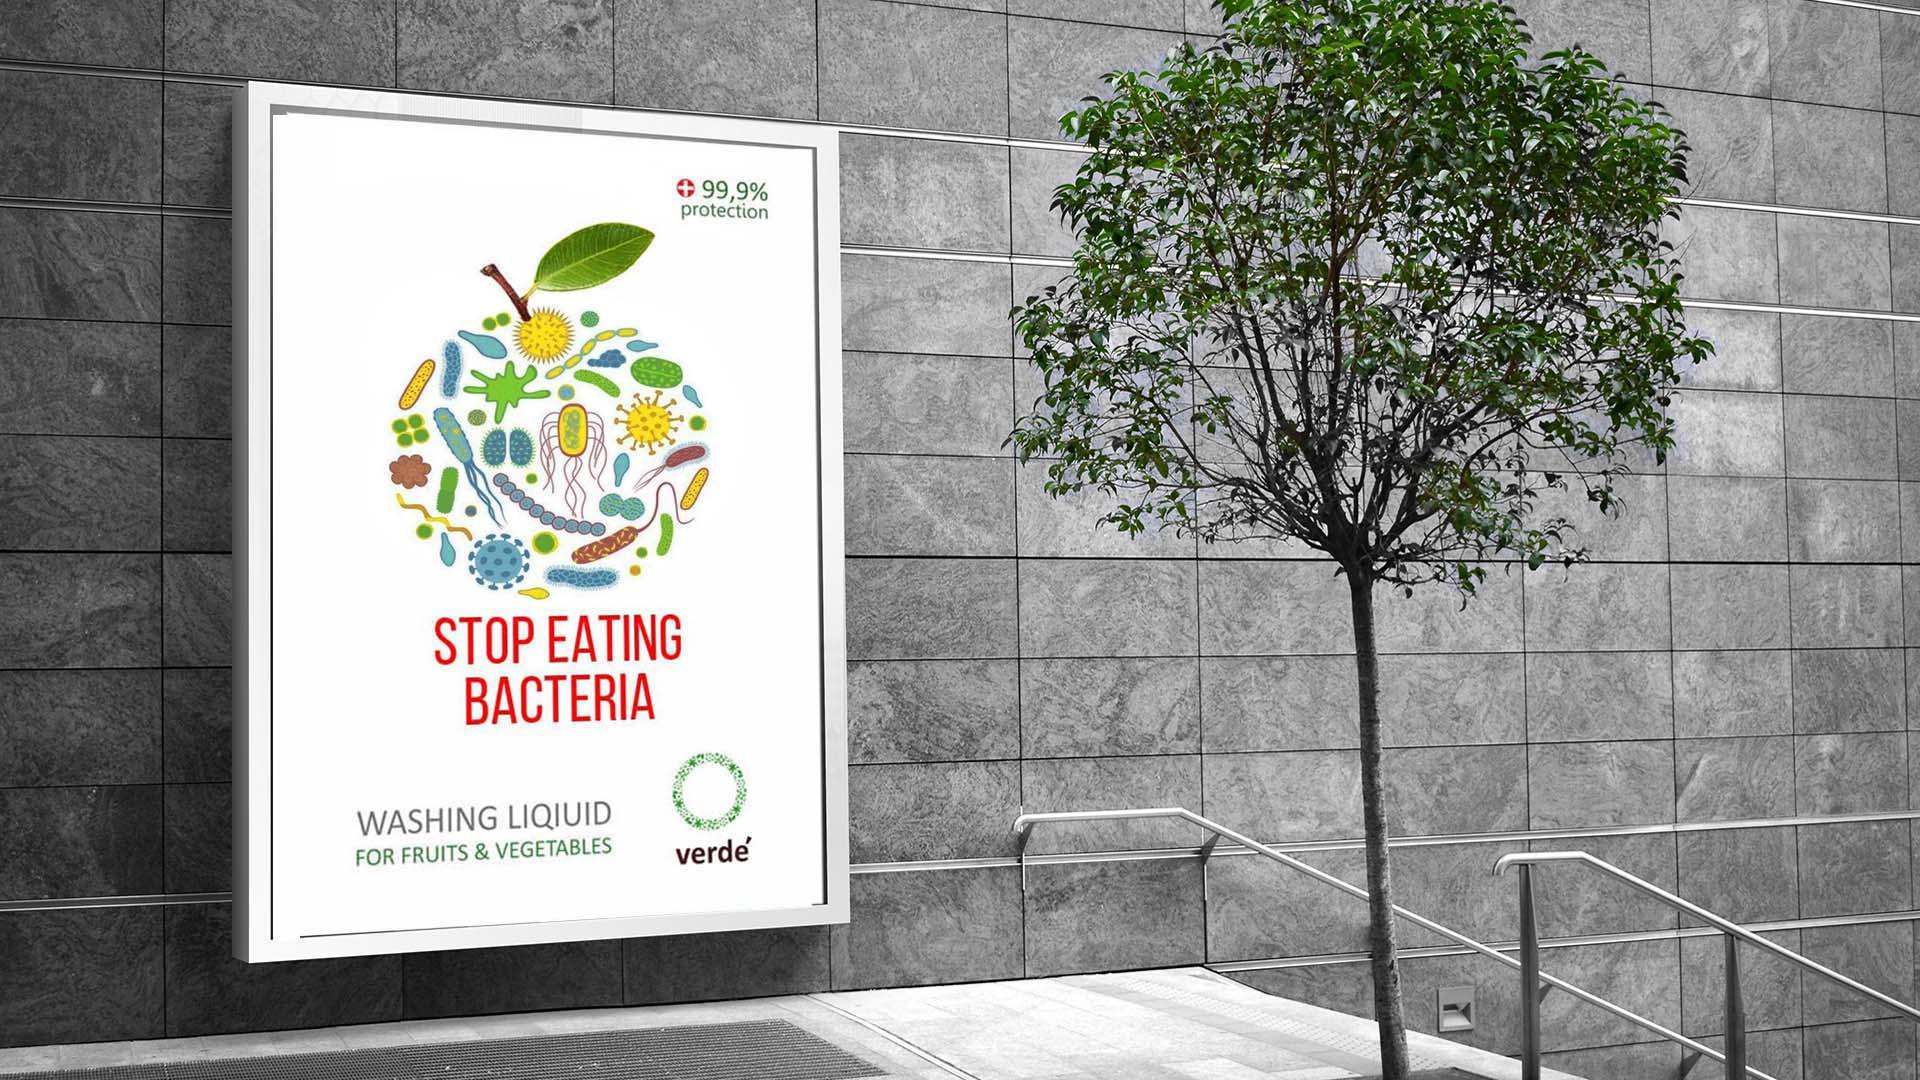 eco branding from stas qlare